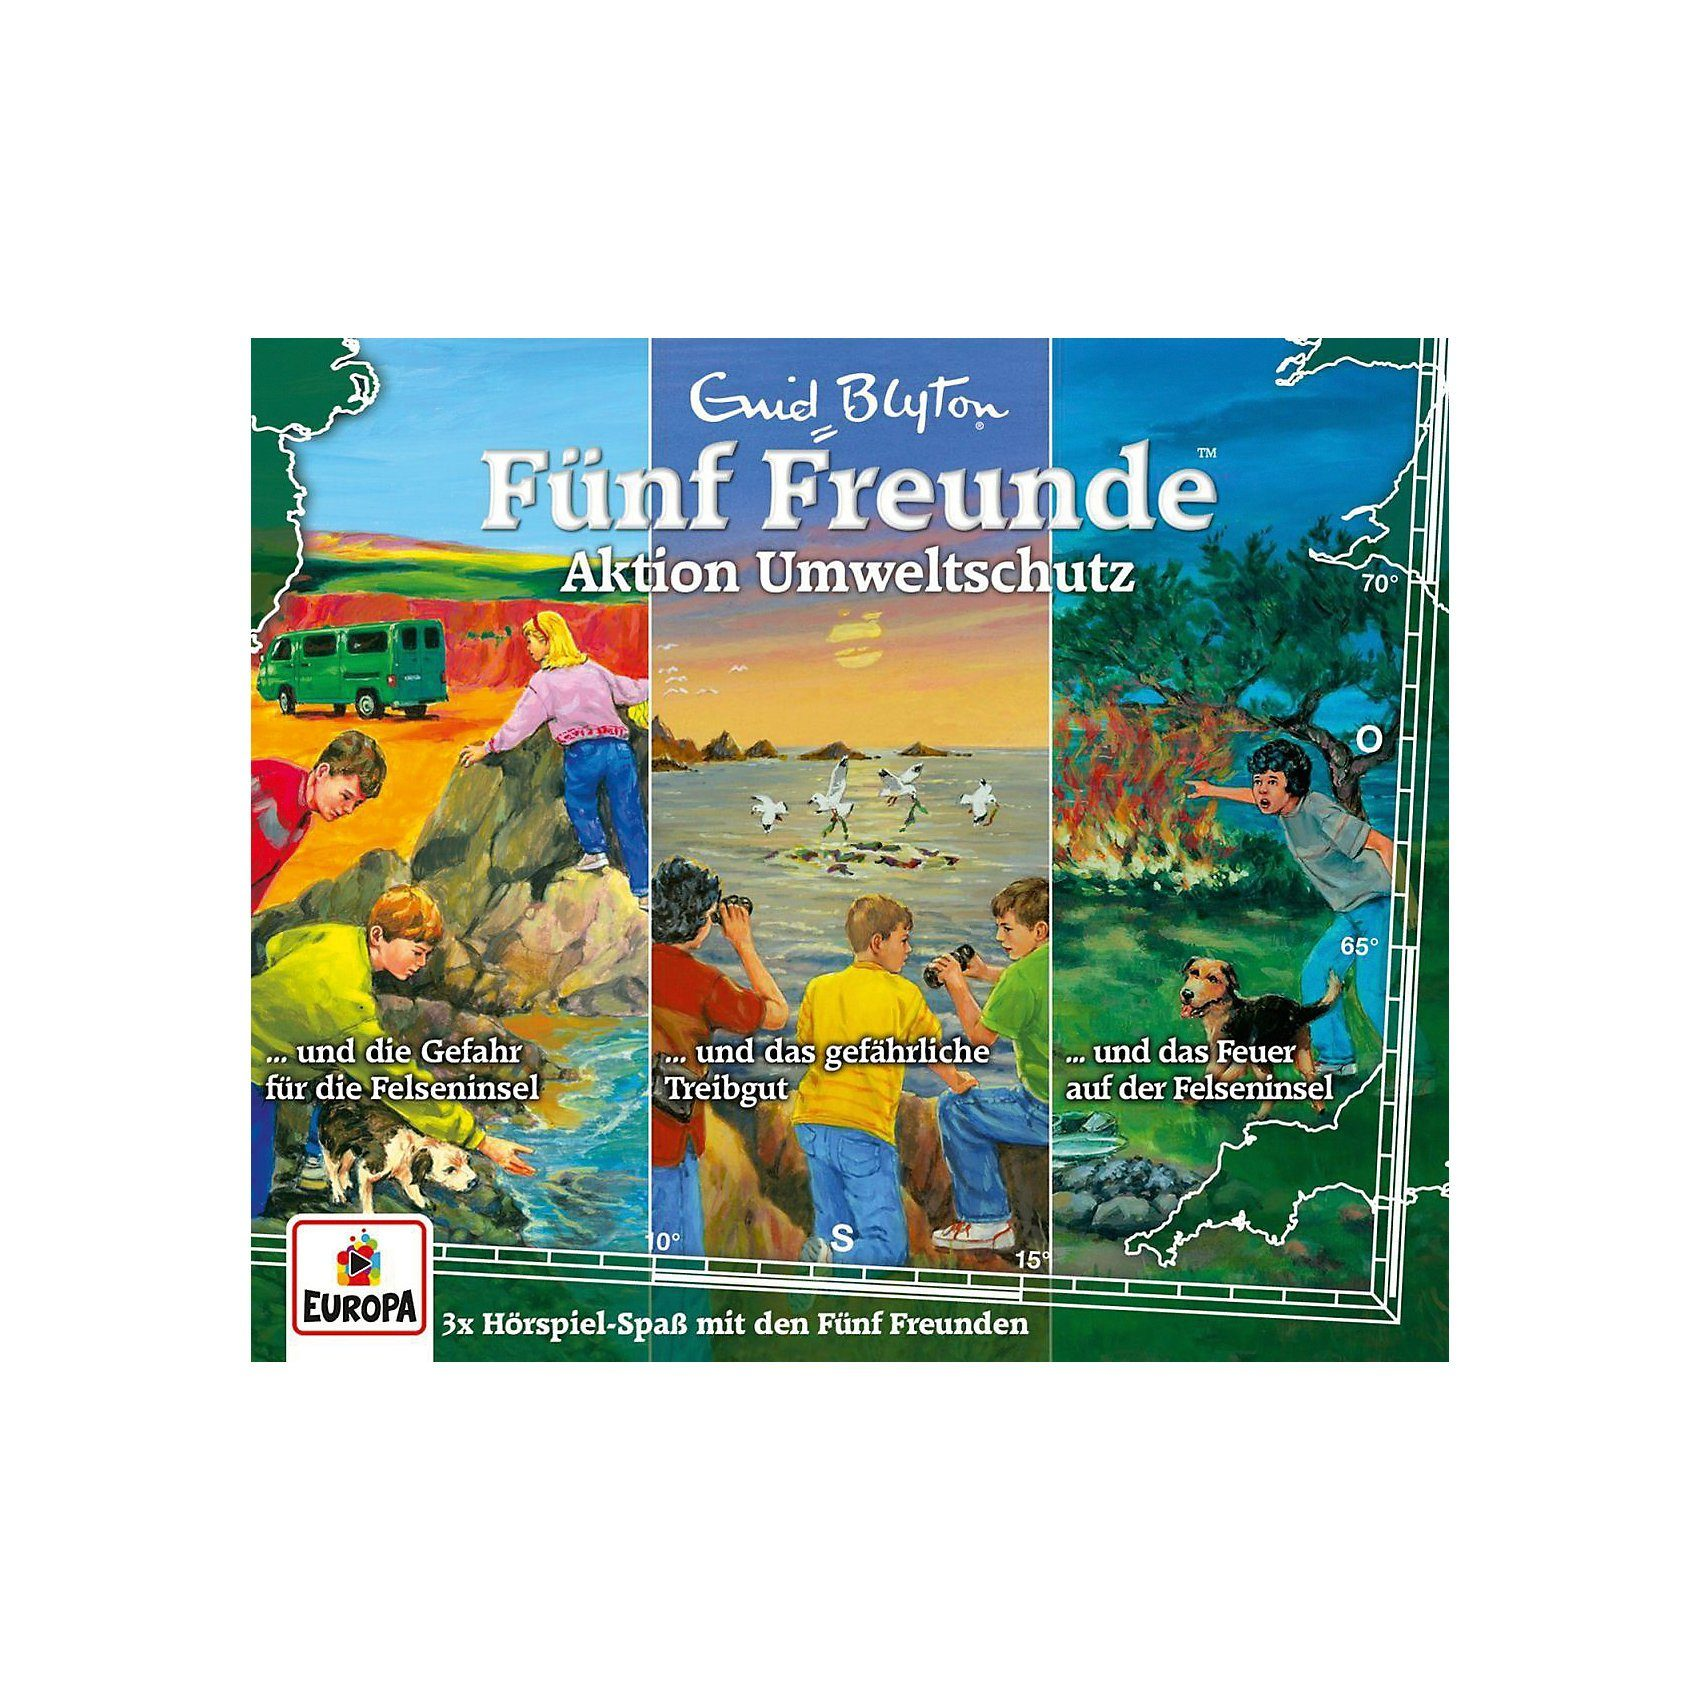 Sony CD Fünf Freunde 27 - 3er Box-Aktion Umweltschutz (69,96,113)